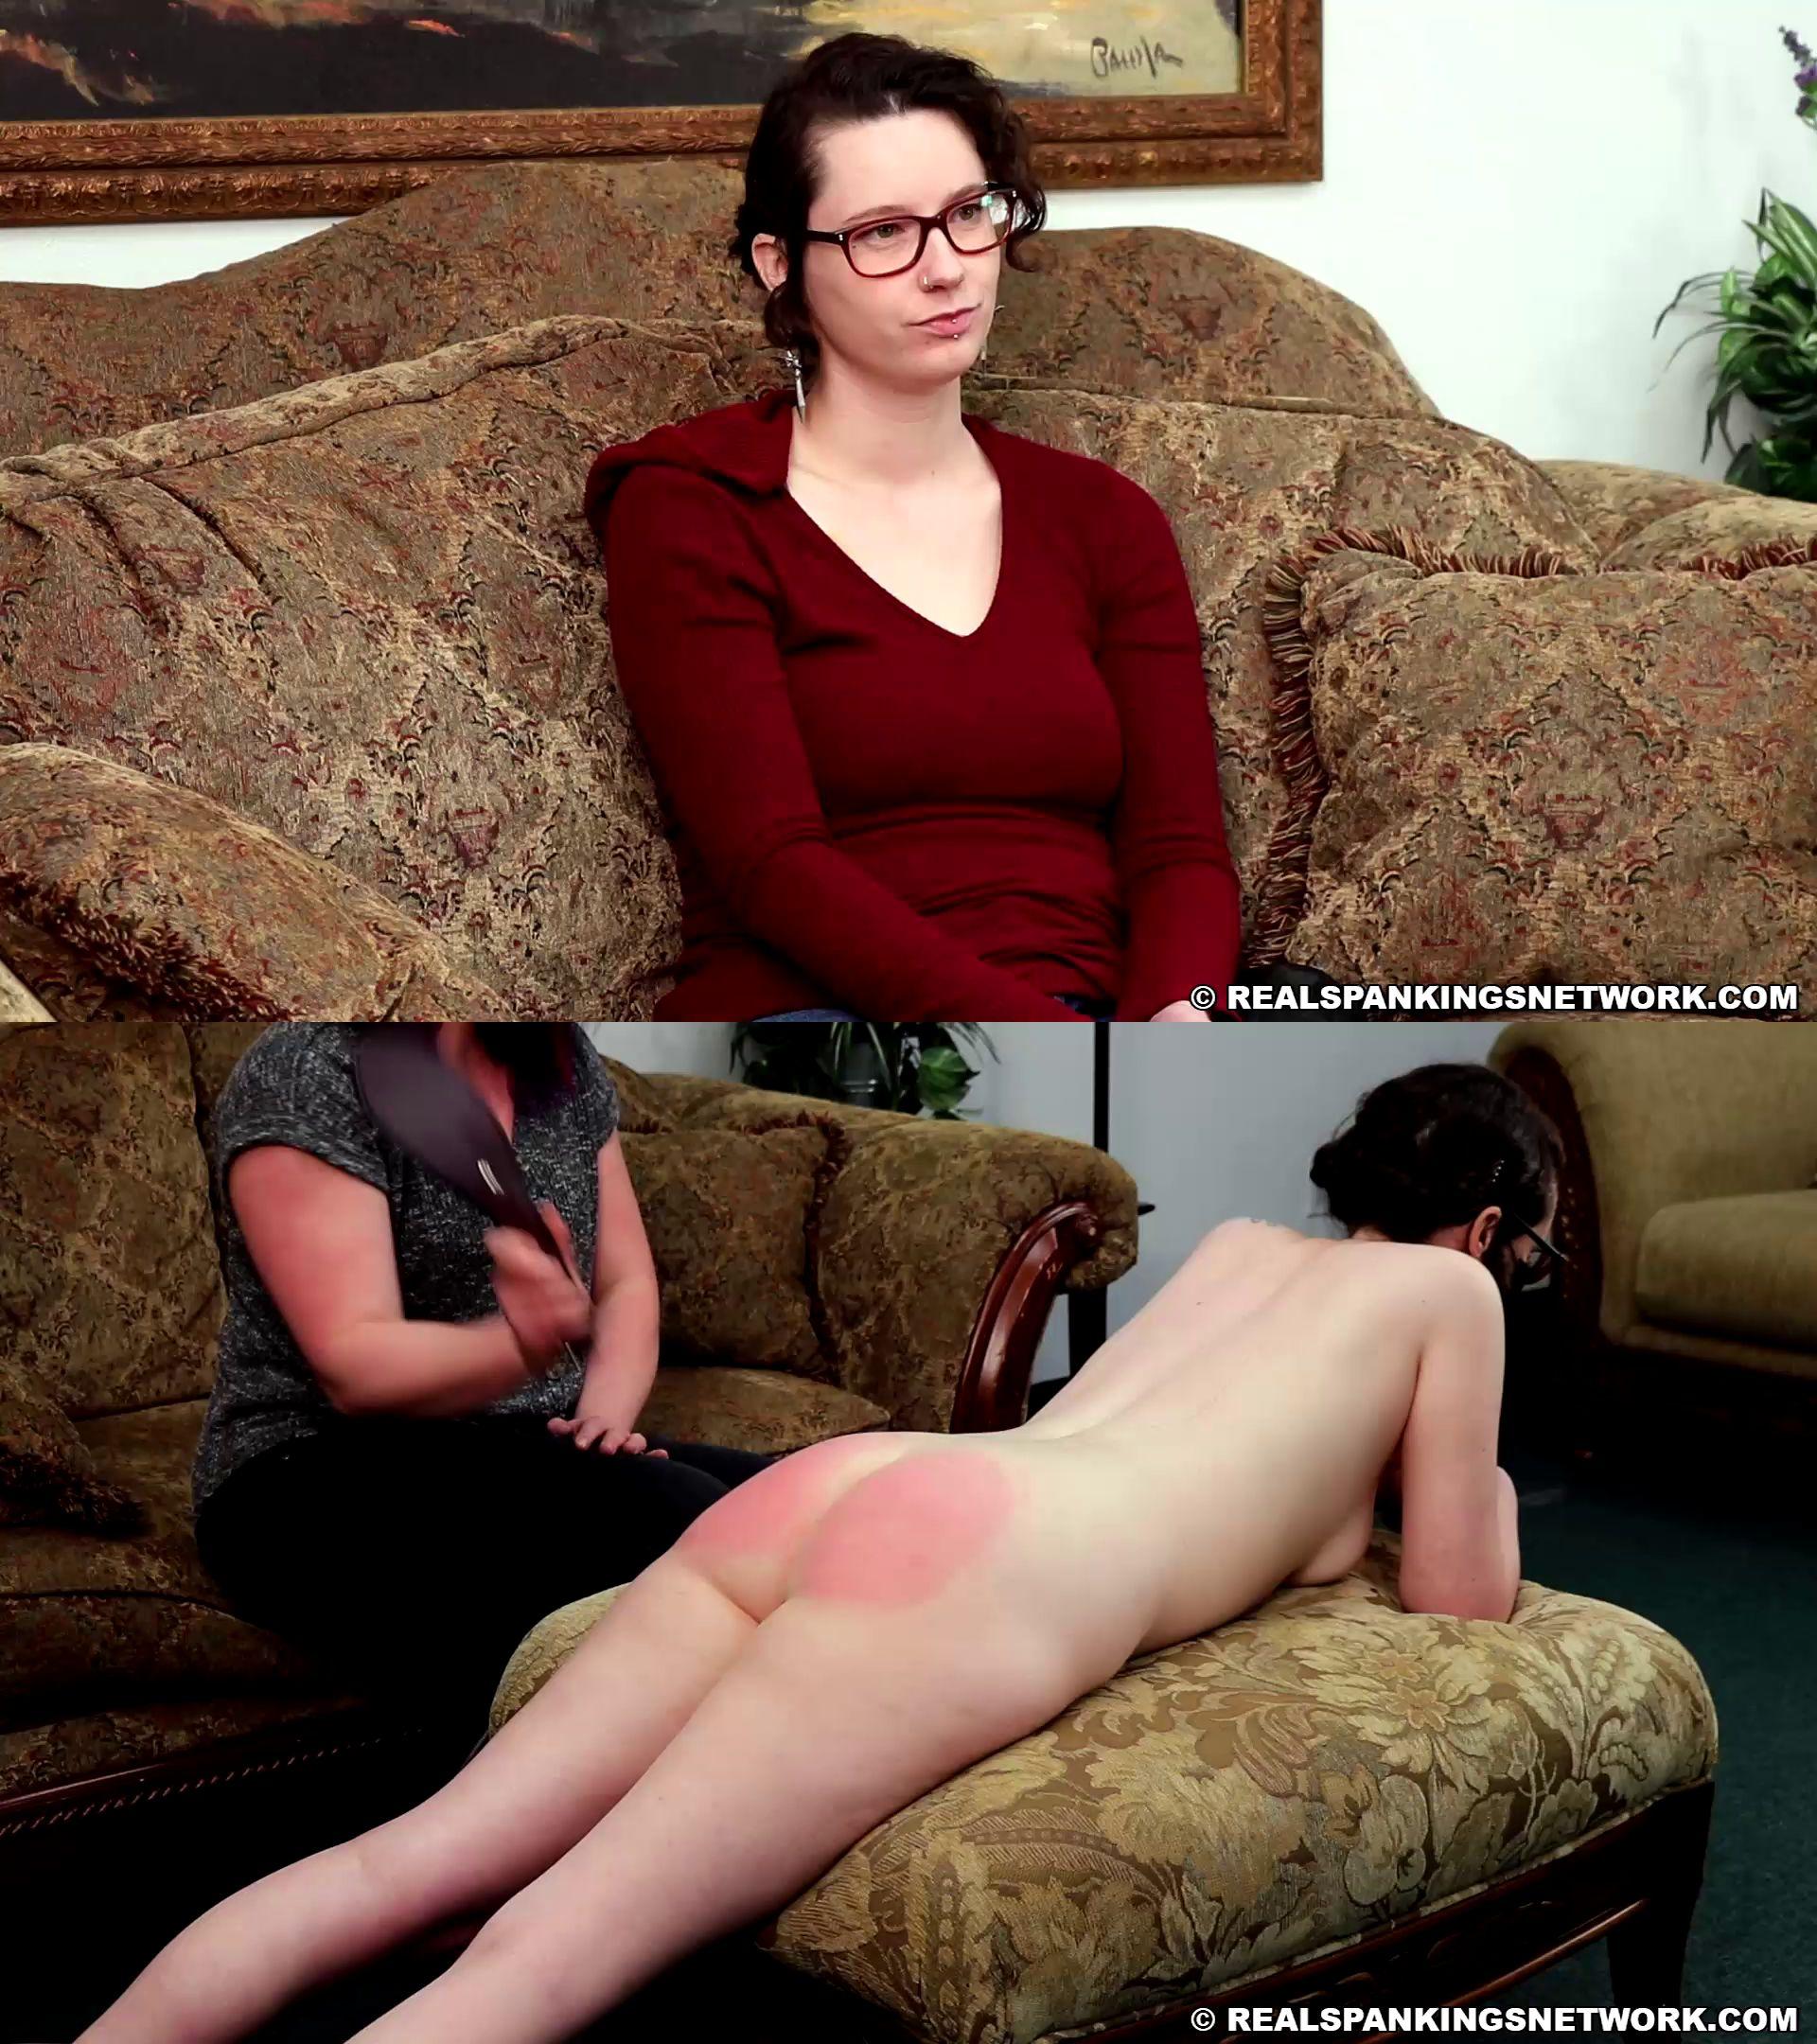 realspankings – MP4/HD – Elizabeth – Punishment Profile: Elizabeth